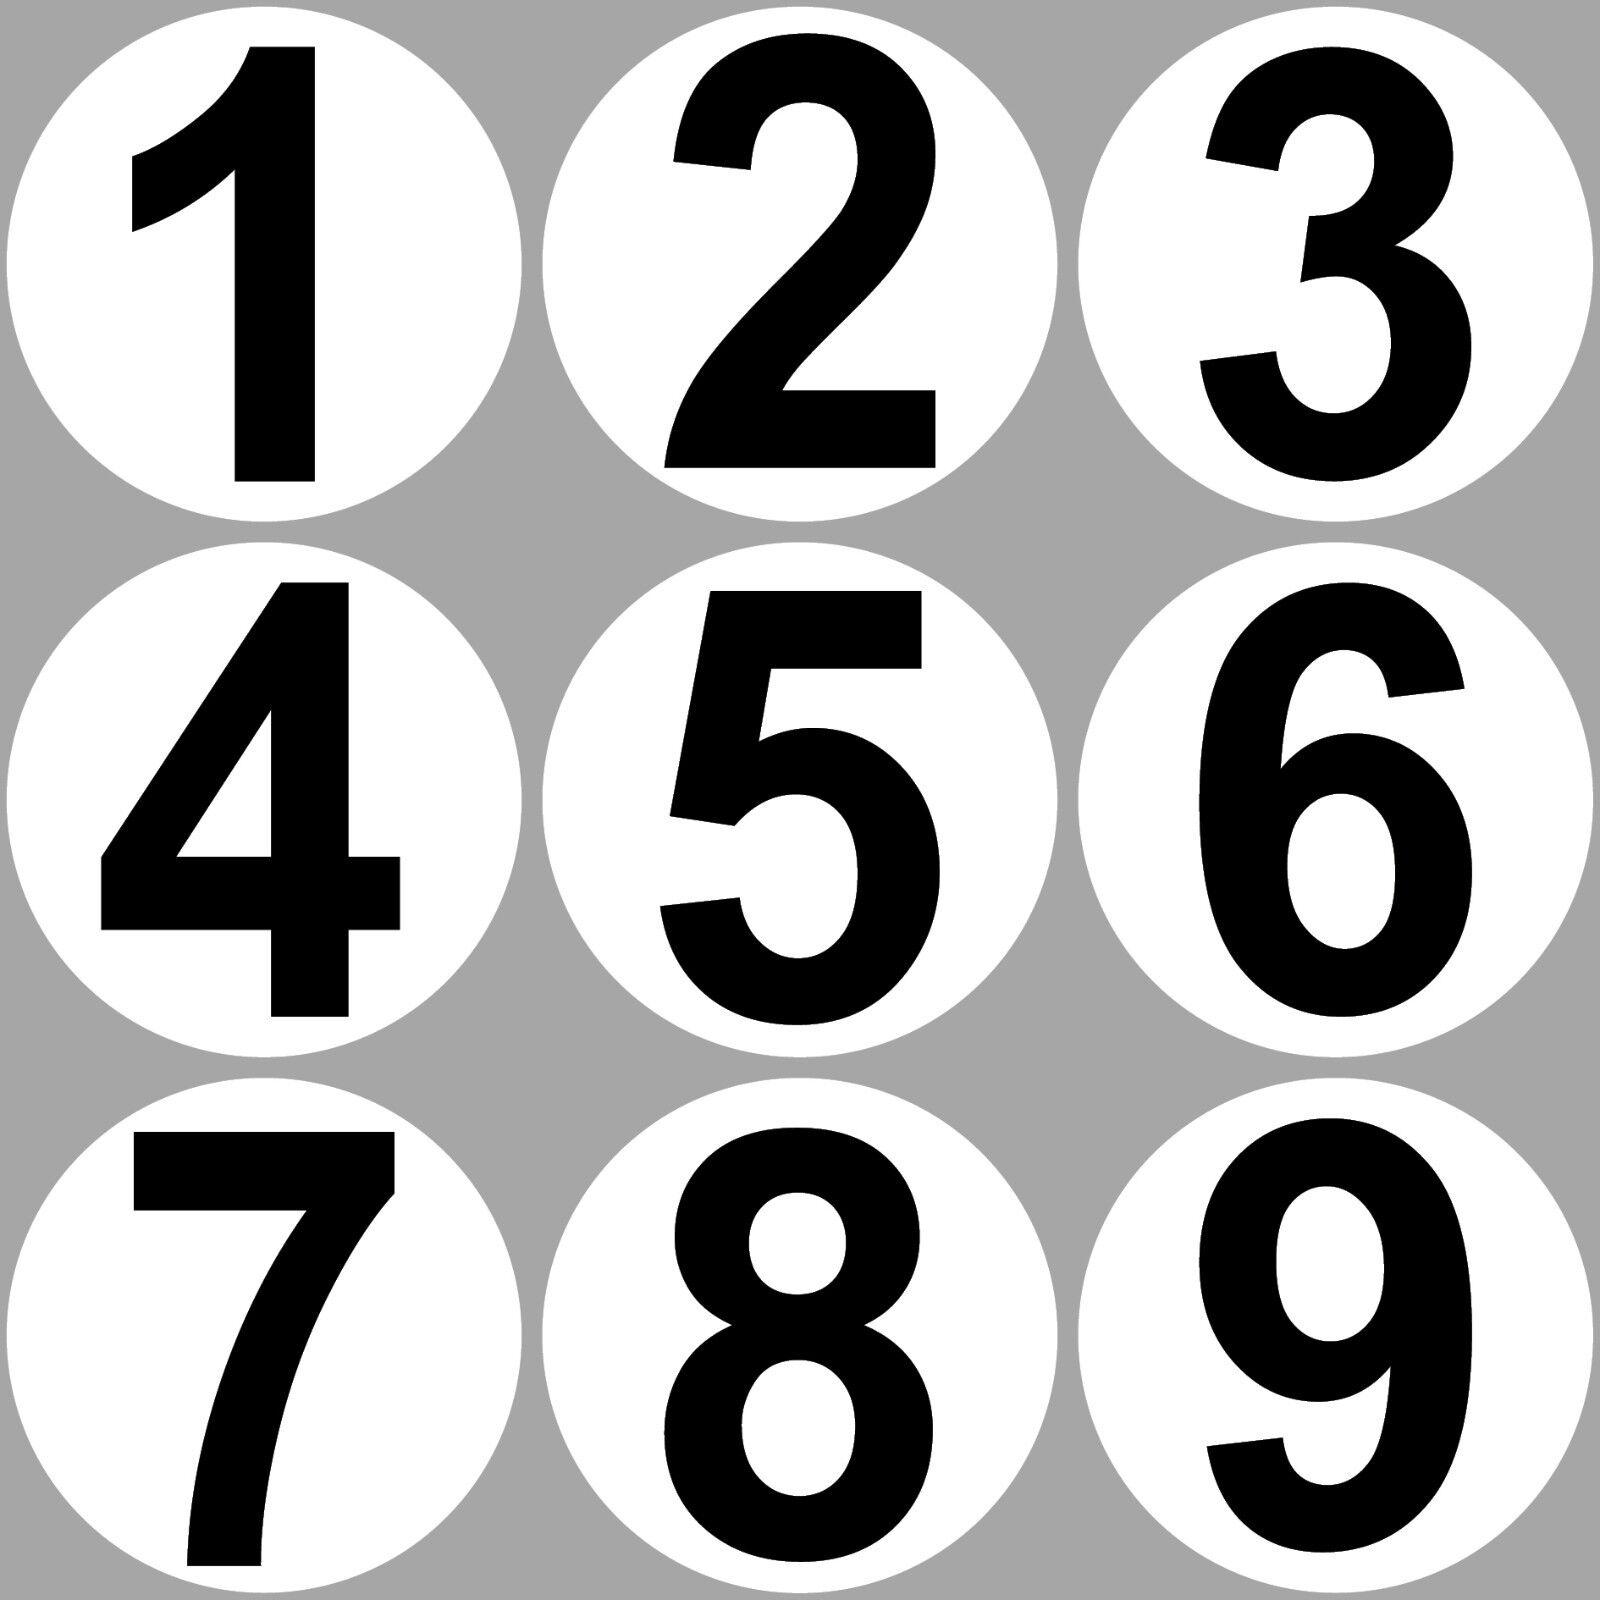 Set 9 Aufkleber 15cm Sticker 1 Bis 9 Start Nummer Zahlen Racing Motor Sport Auto Yategocom